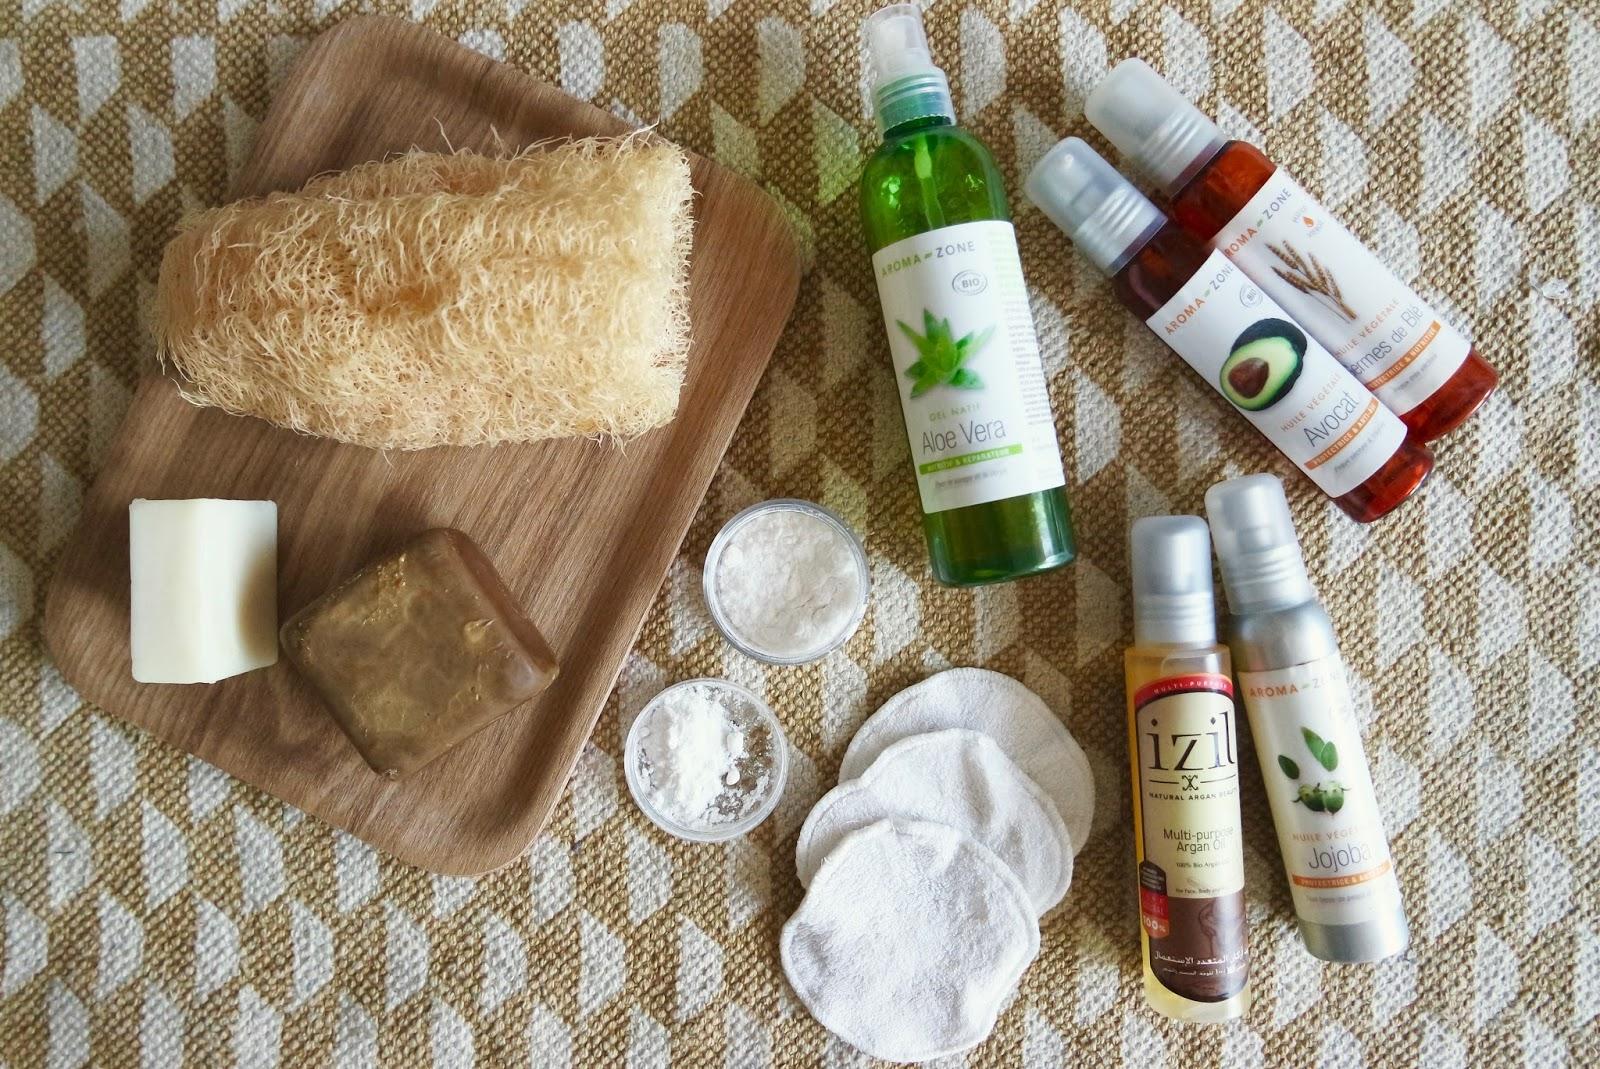 aleppo soap, shampoo bar, organic oil, argan, avocado, jojoba, bamboo pads